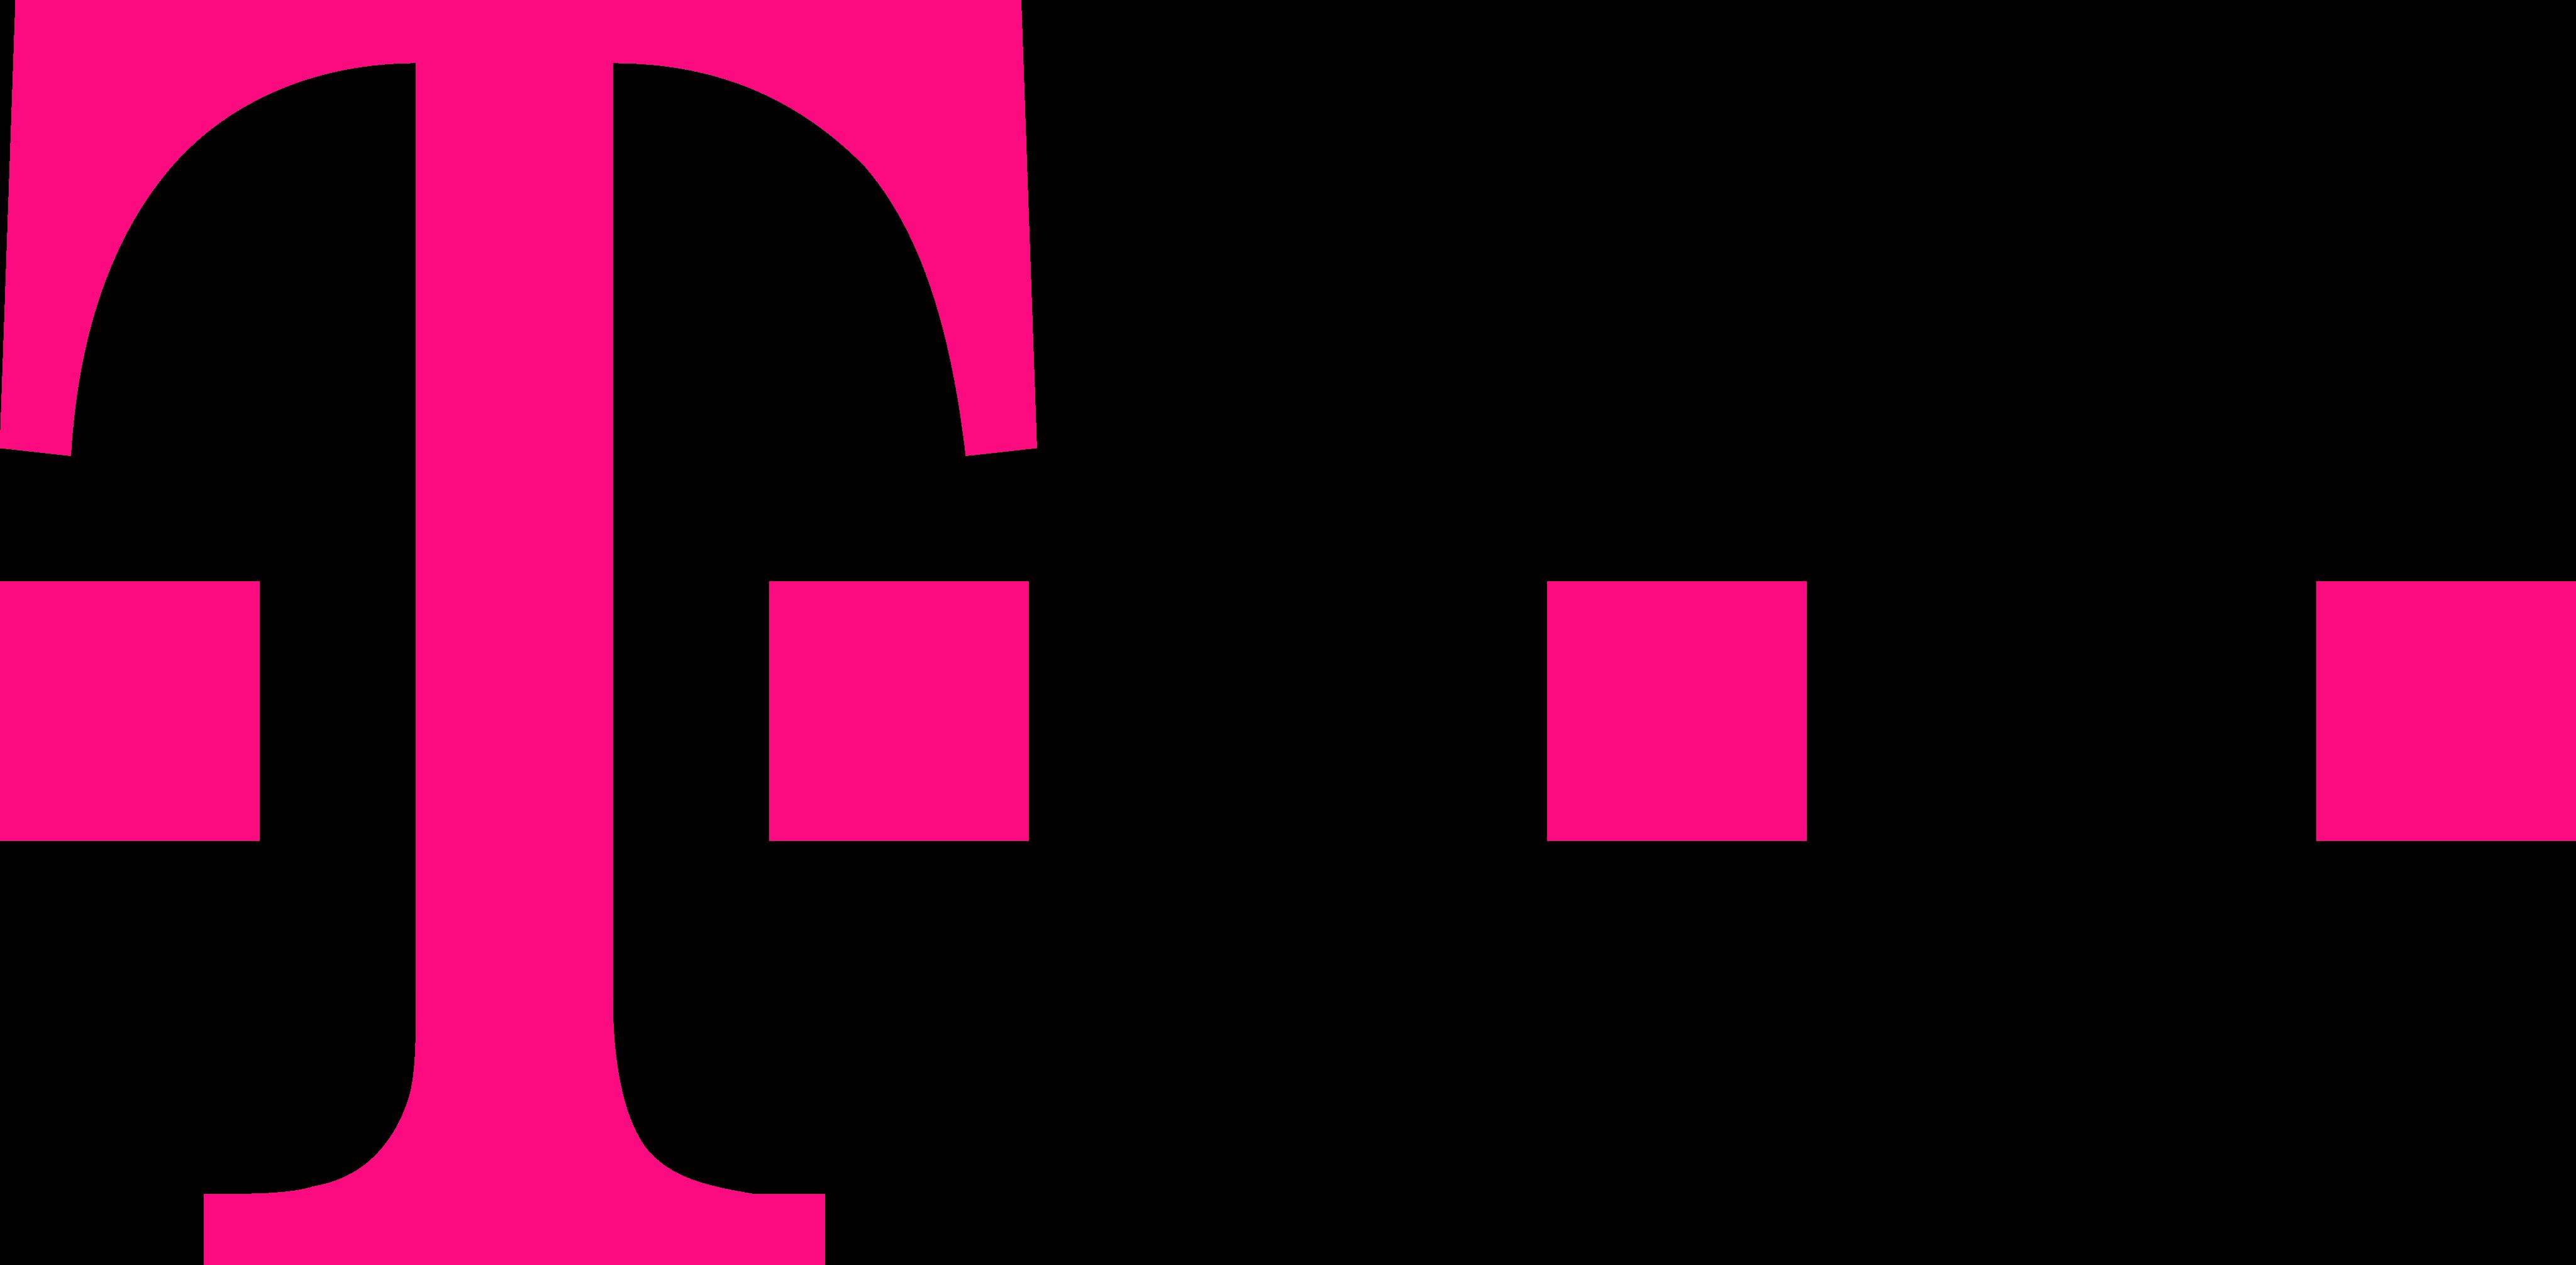 deutsche telekom logo - Deutsche Telekom Logo